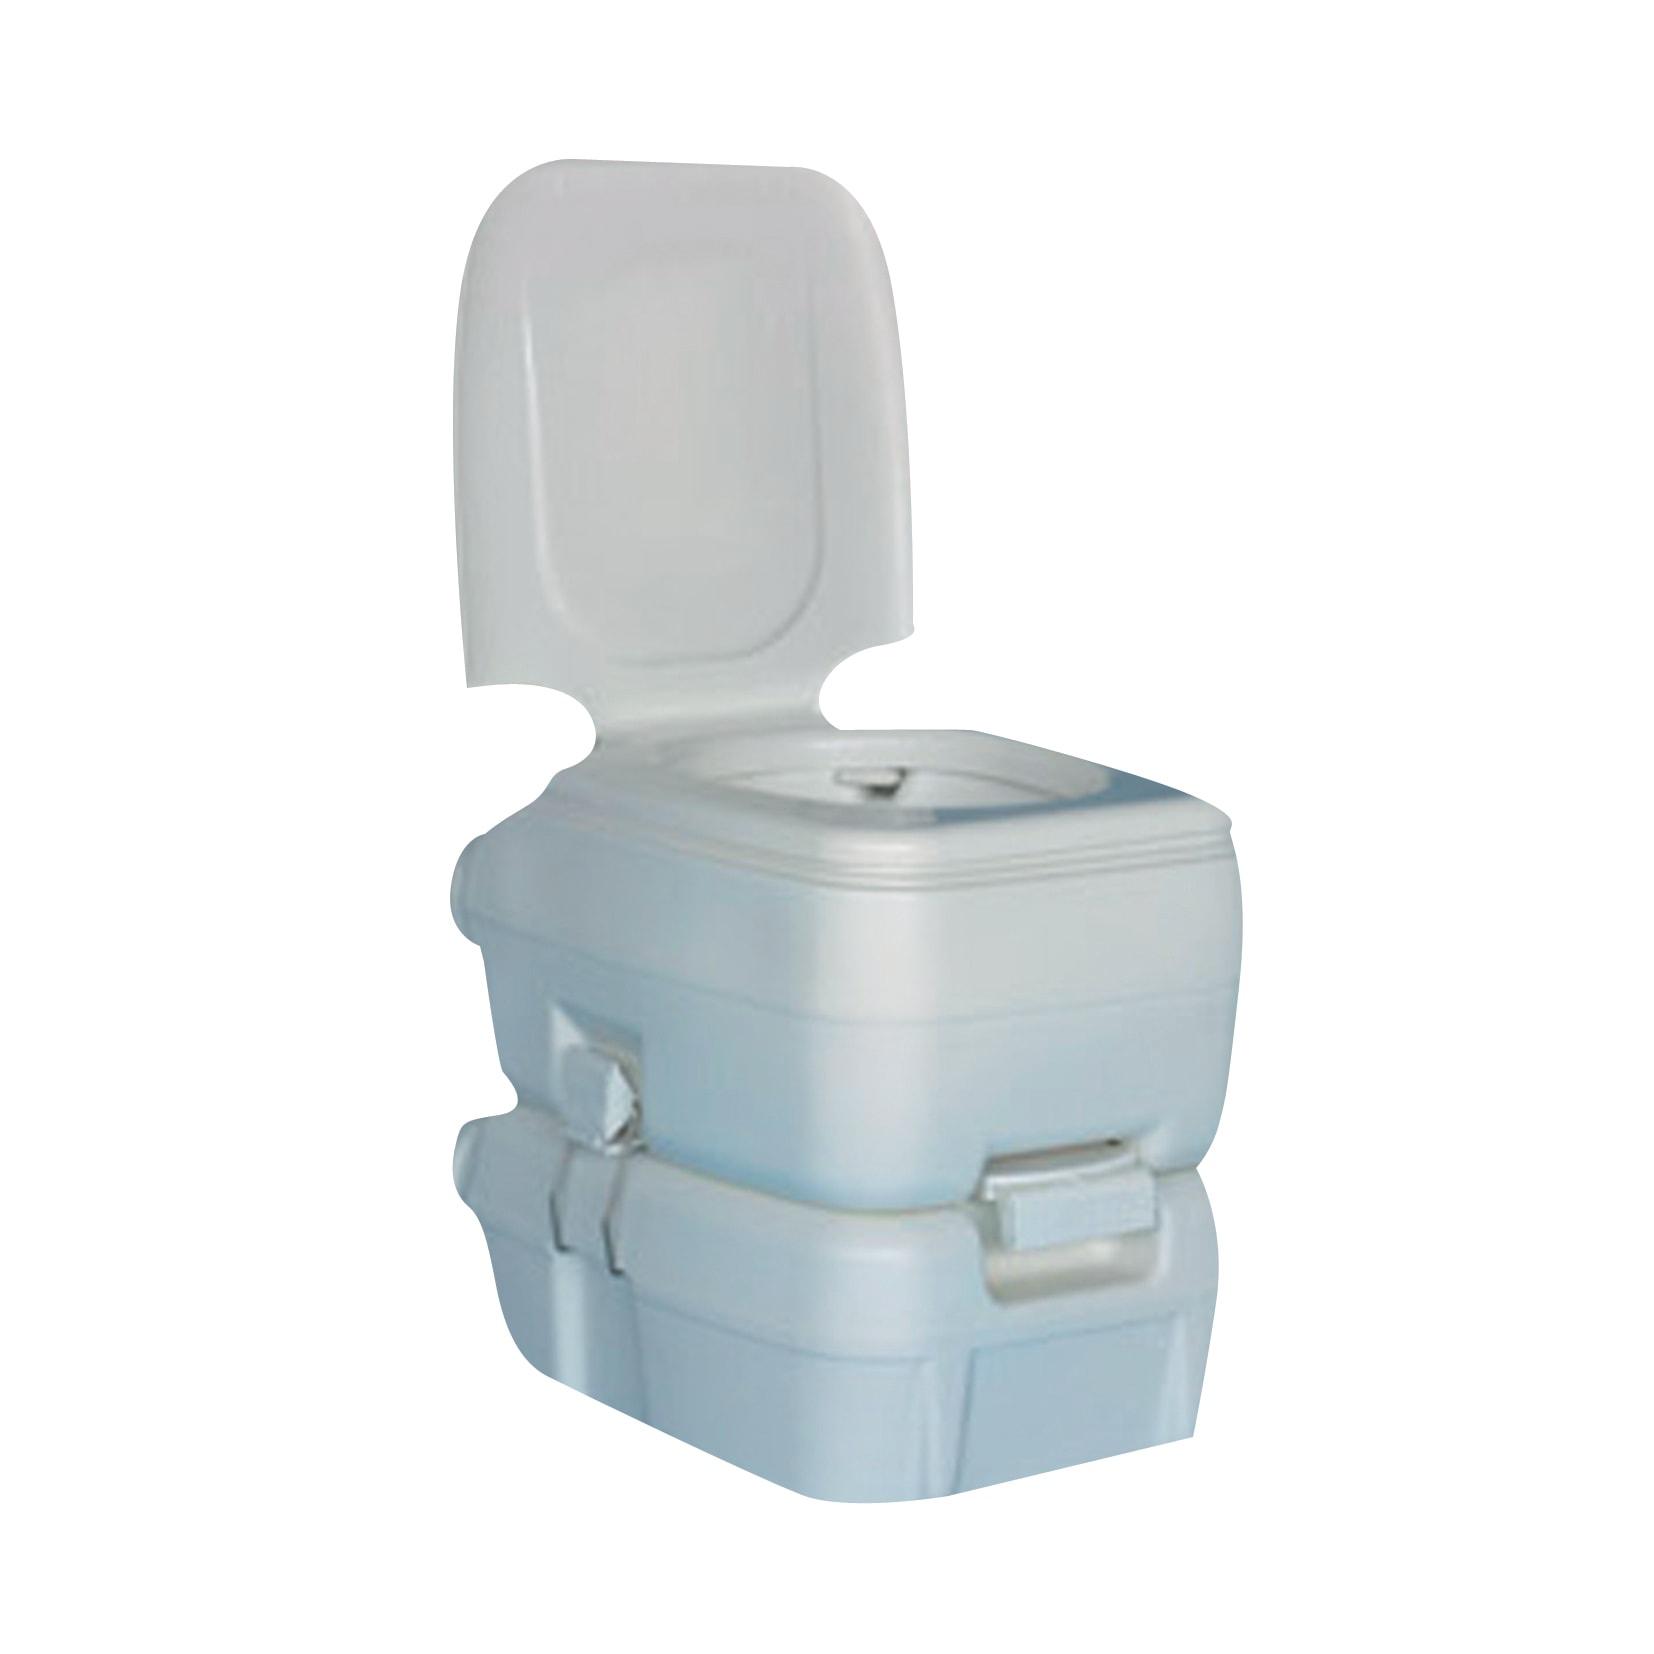 Toilette Chimica Bi Pot 39 15 L Prezzi E Offerte Online Leroy Merlin